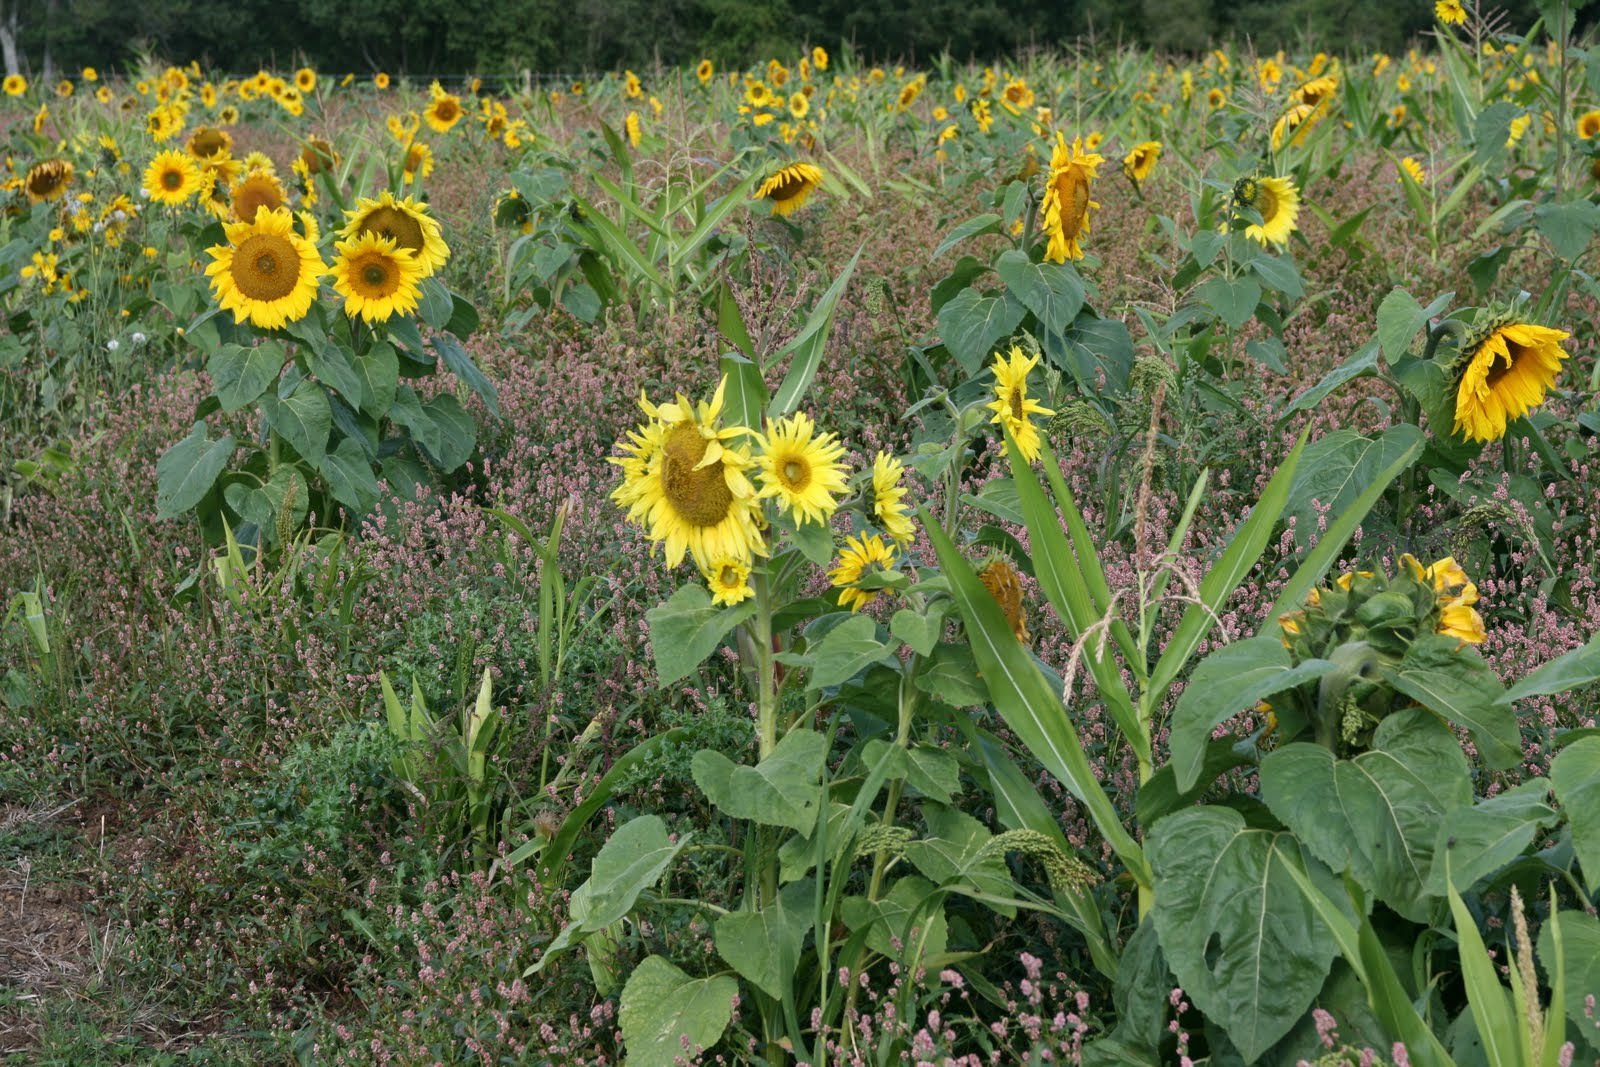 1008 070 Alton Circular, Hampshire, England Sunflowers